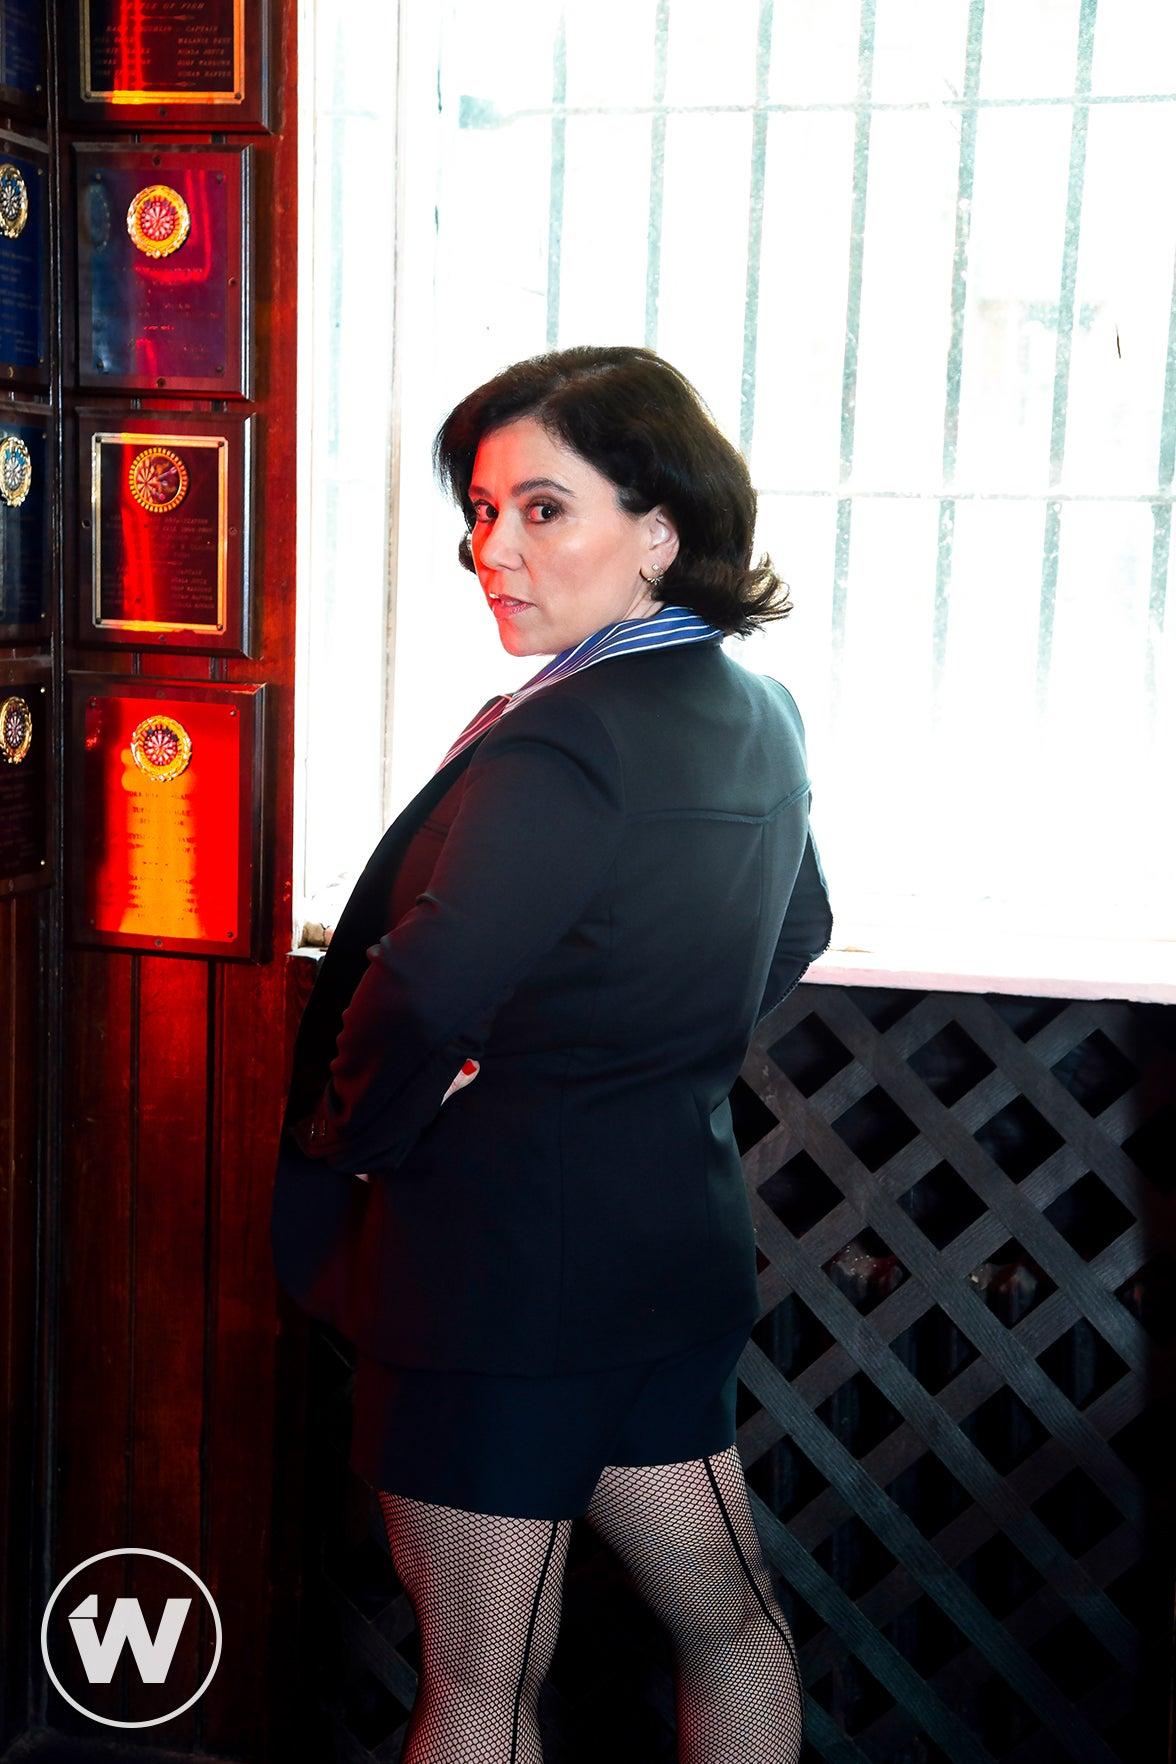 Alex Borstein, The Marvelous Mrs. Maisel